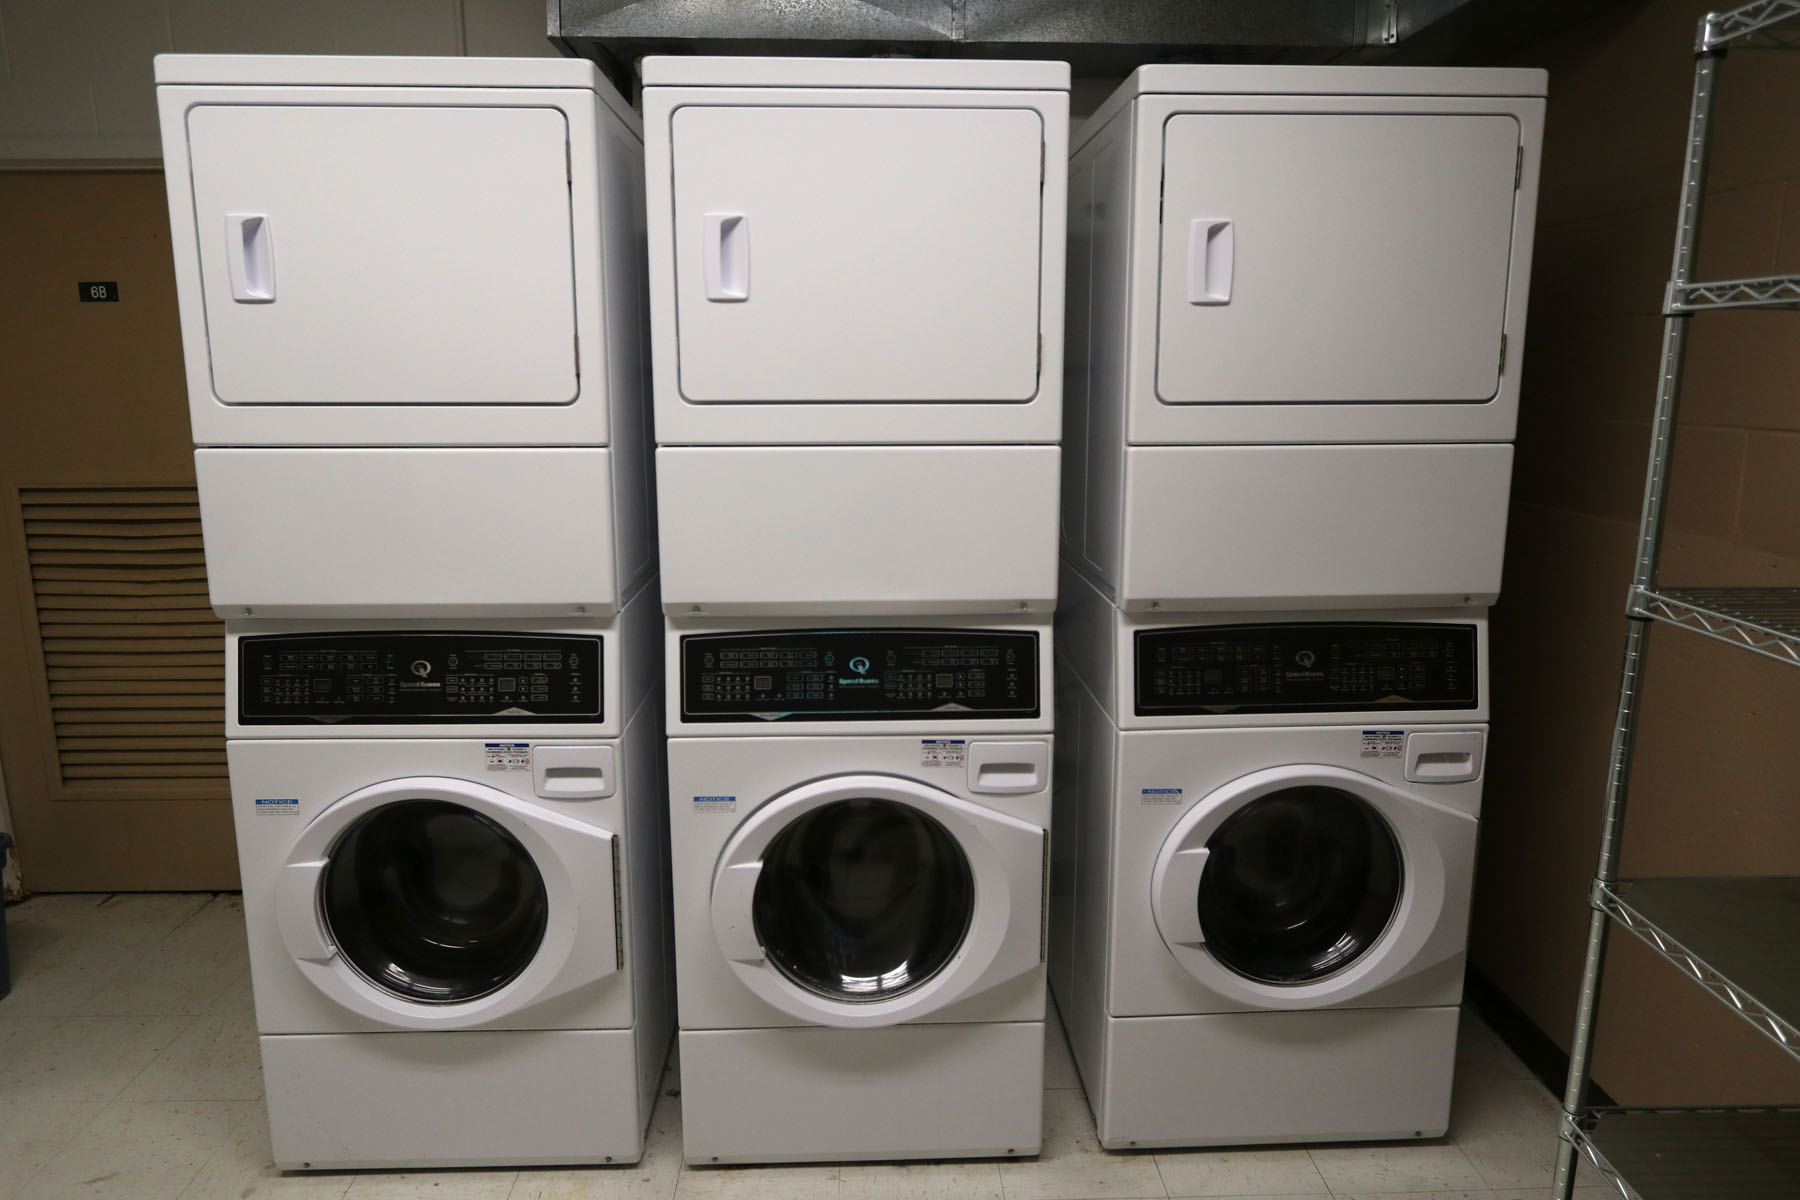 Milligan Hall Laundry